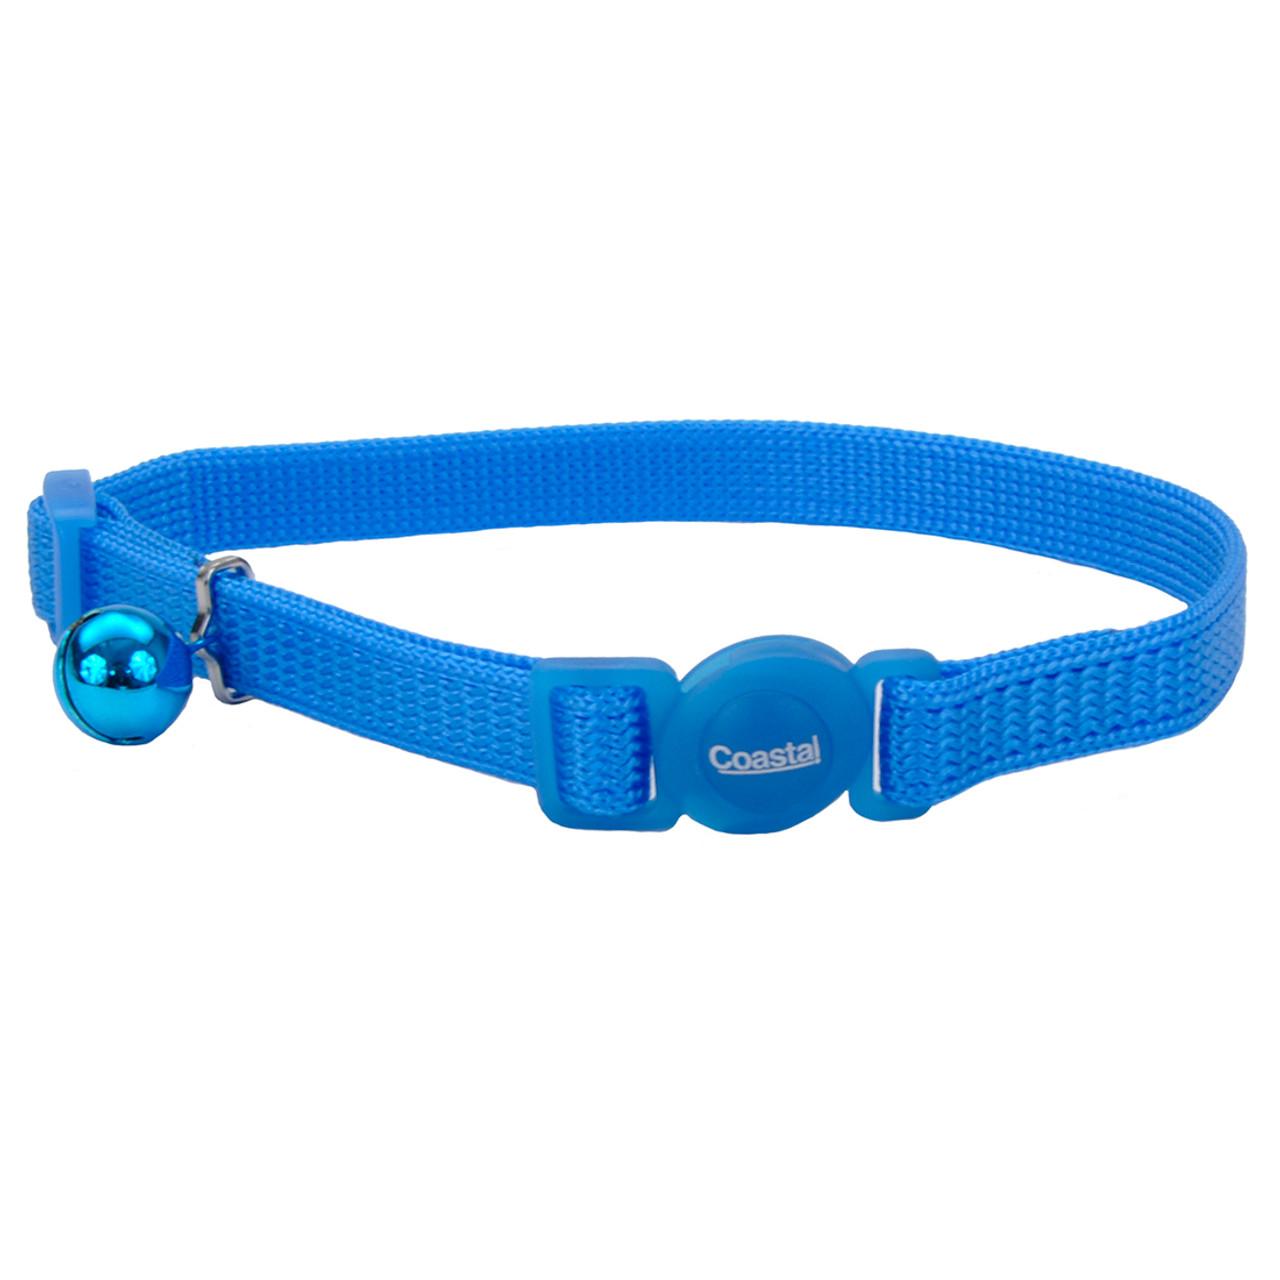 Safe Cat Adjustable Snag-Proof Breakaway Blue Lagoon Cat Collar